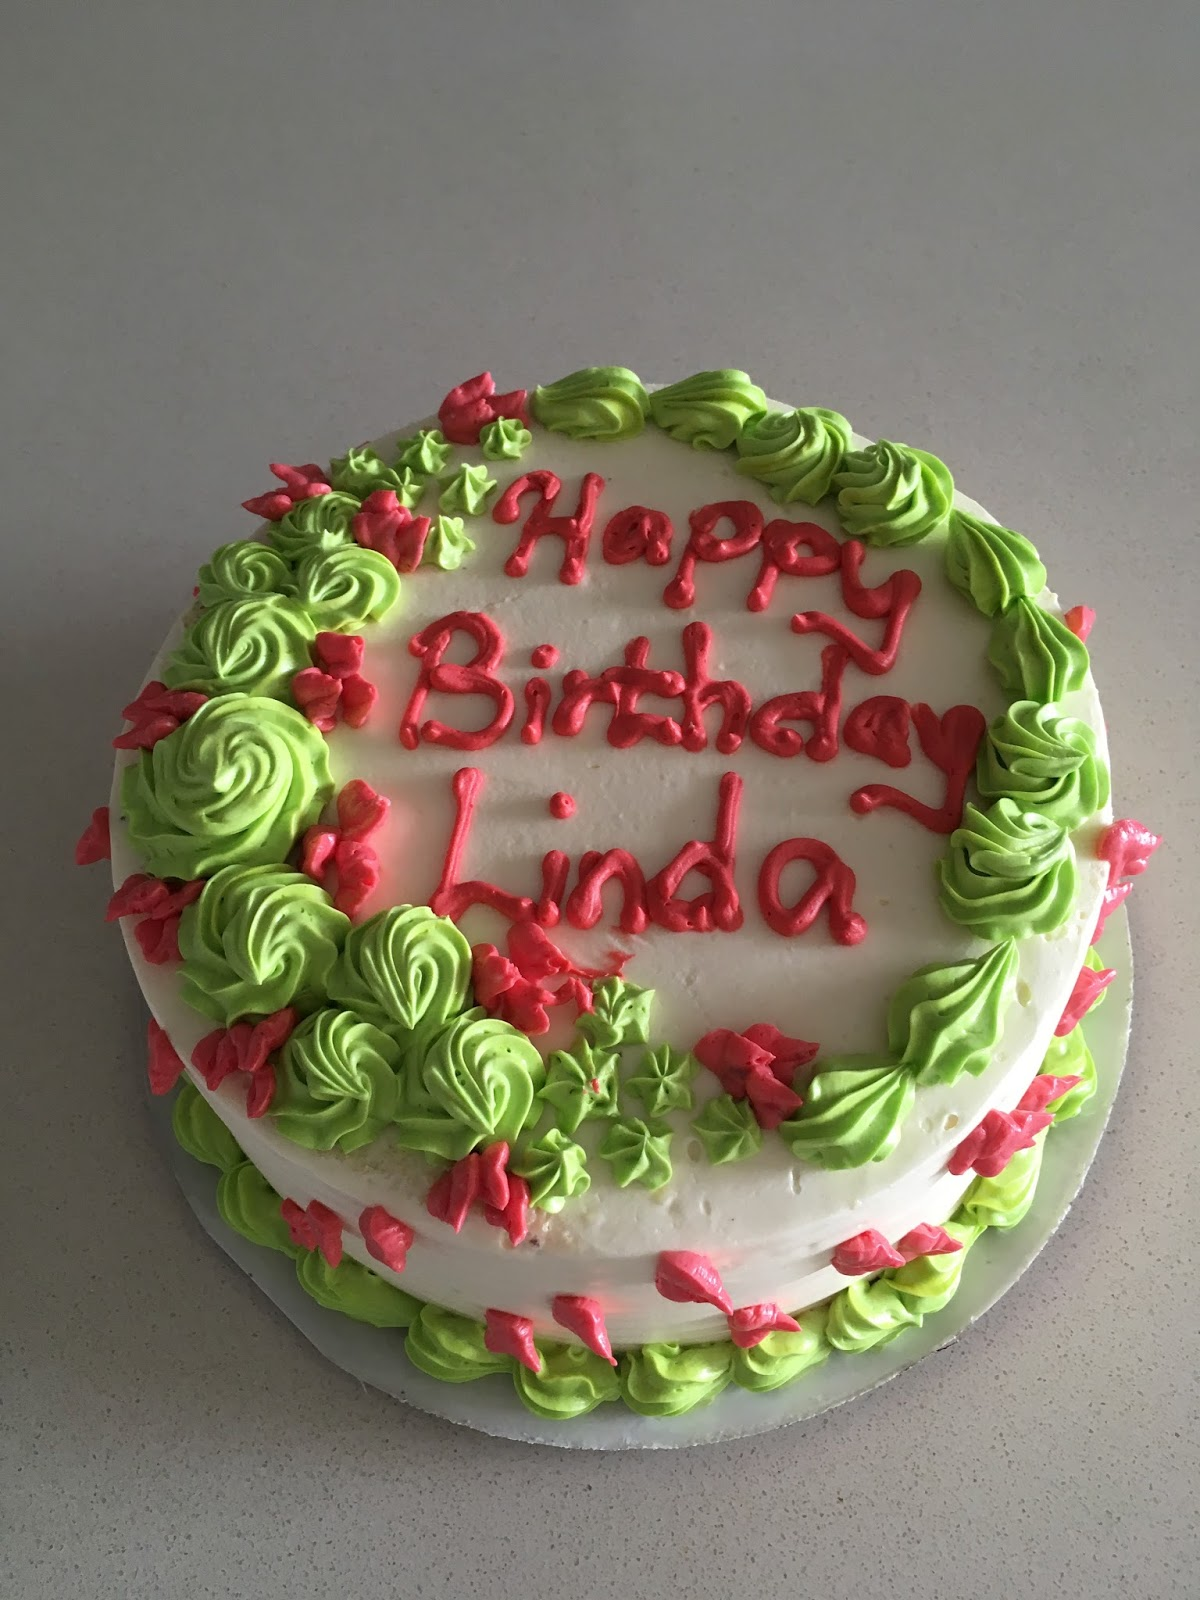 Chris And Linda Wakild West Africa Area Ghana Based Lindas Birthday